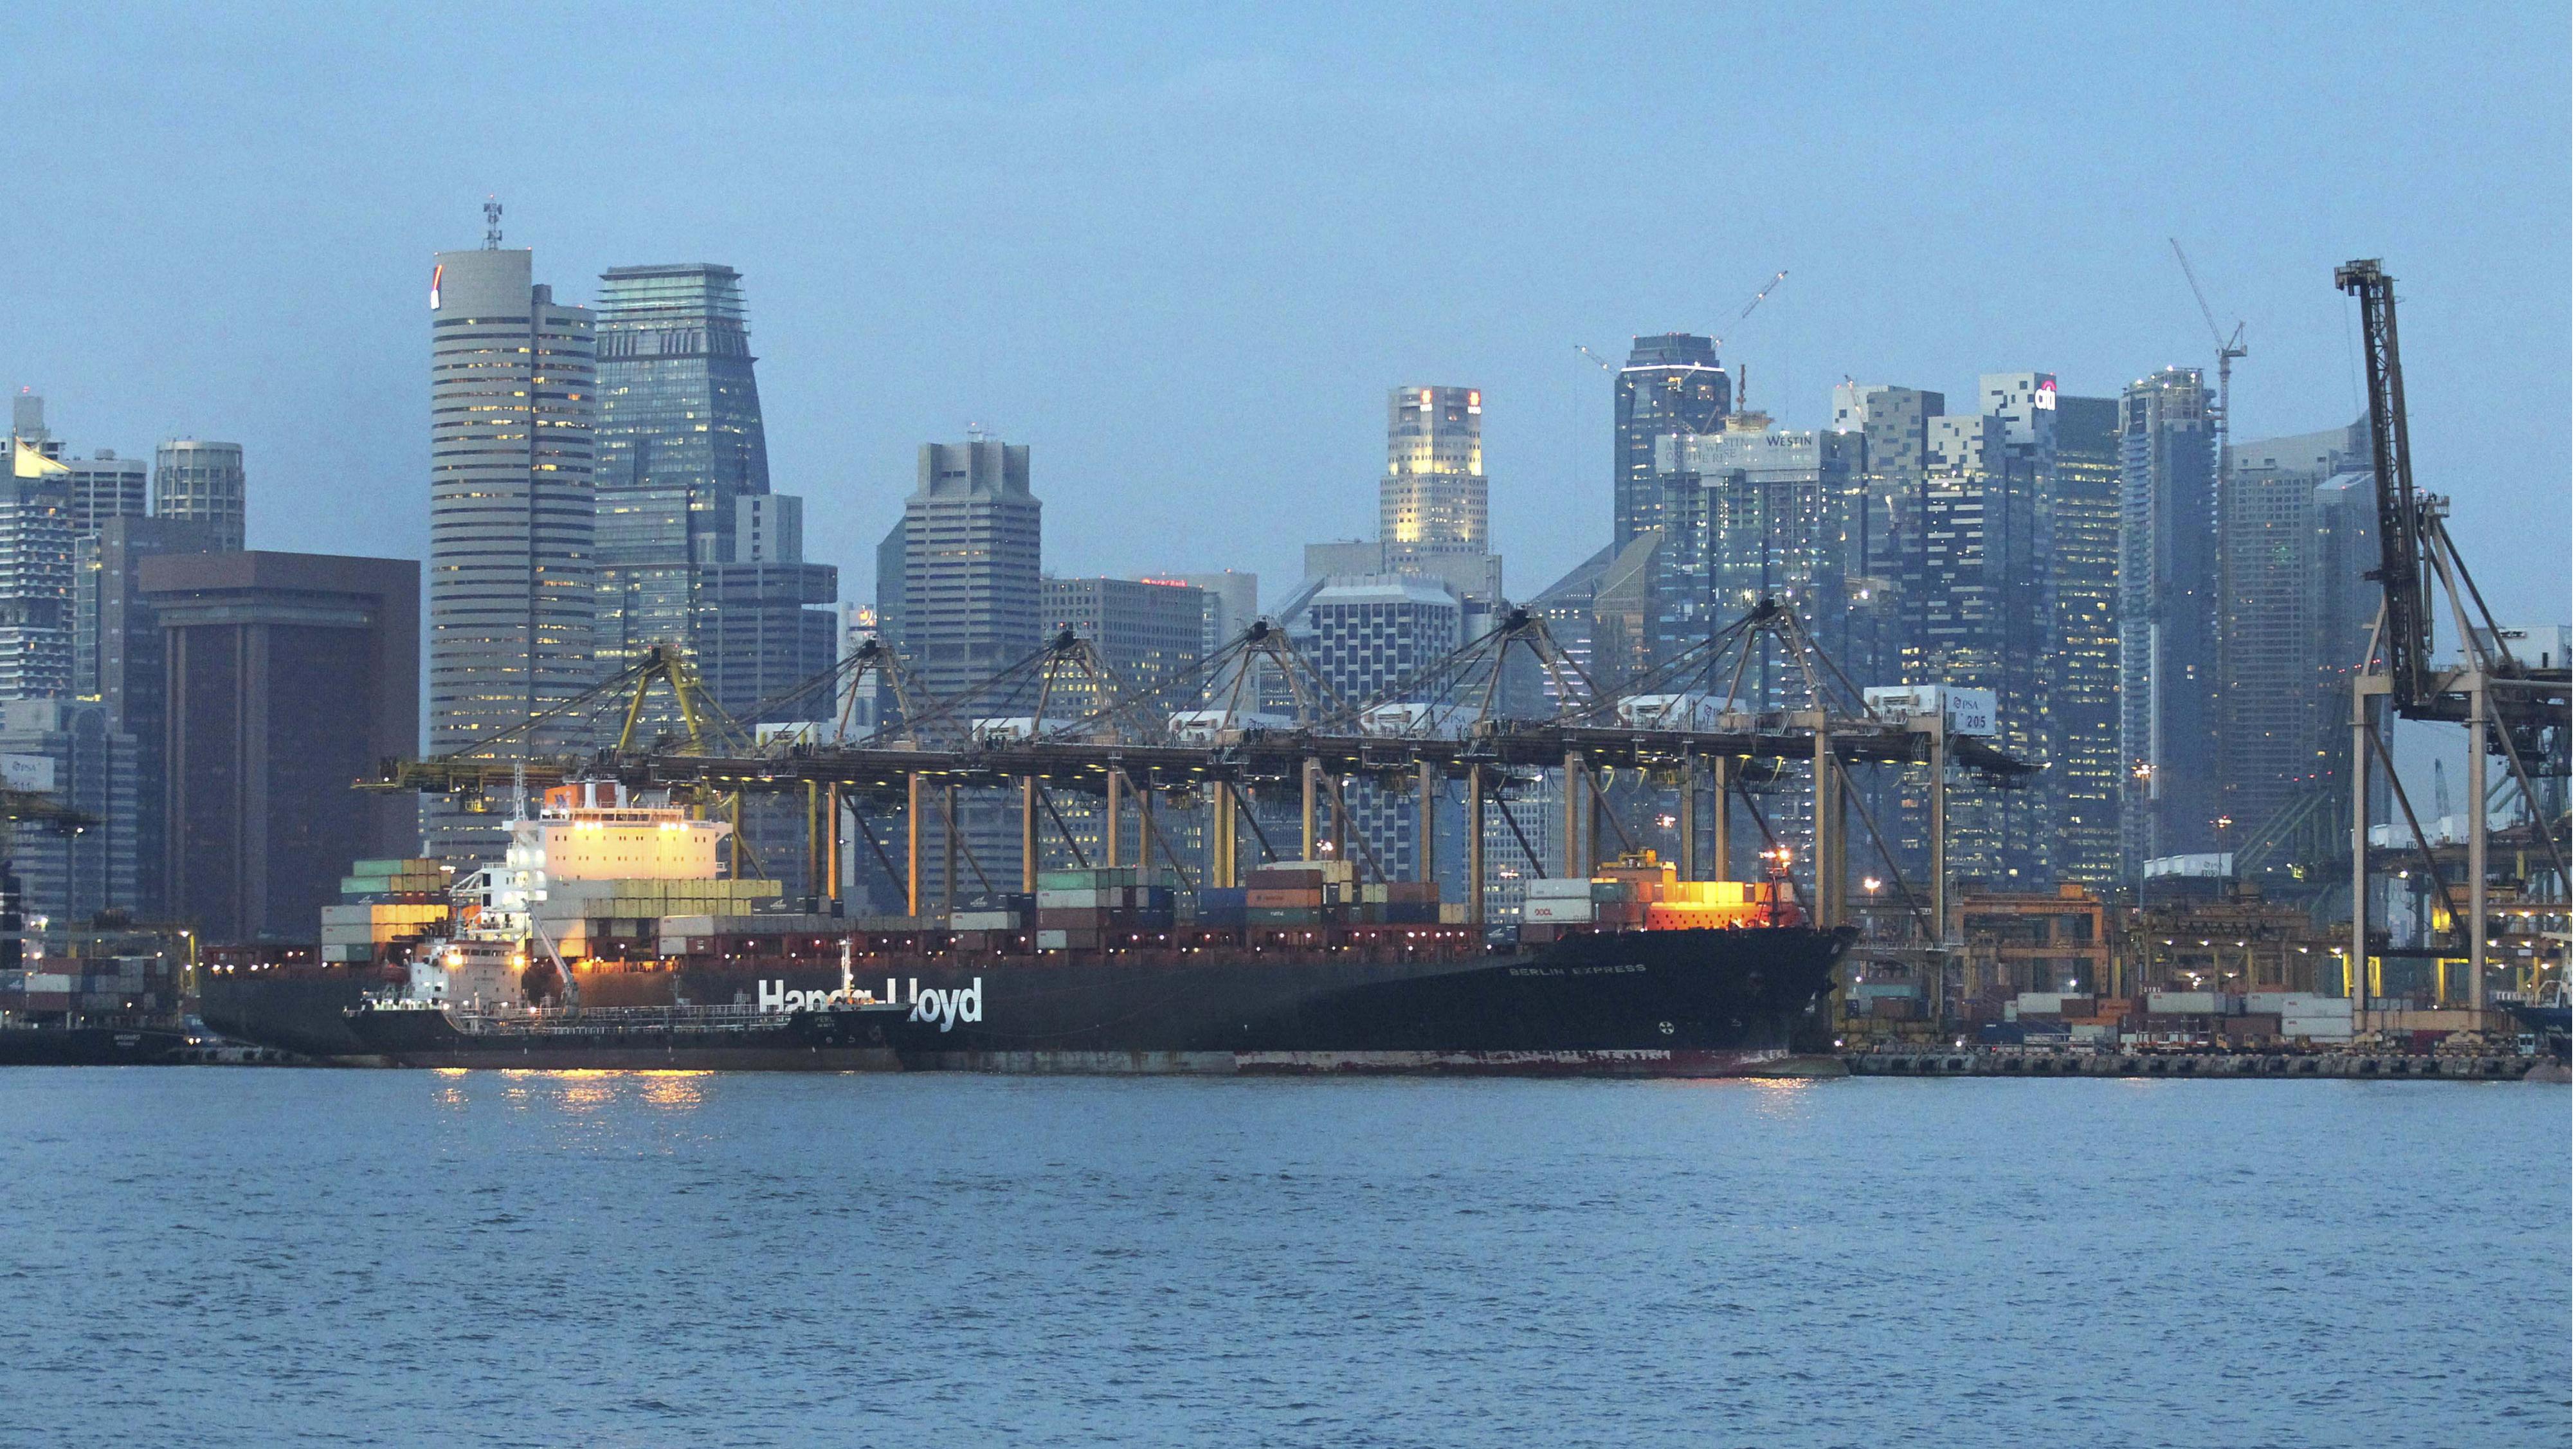 Cargo ship in Singapore